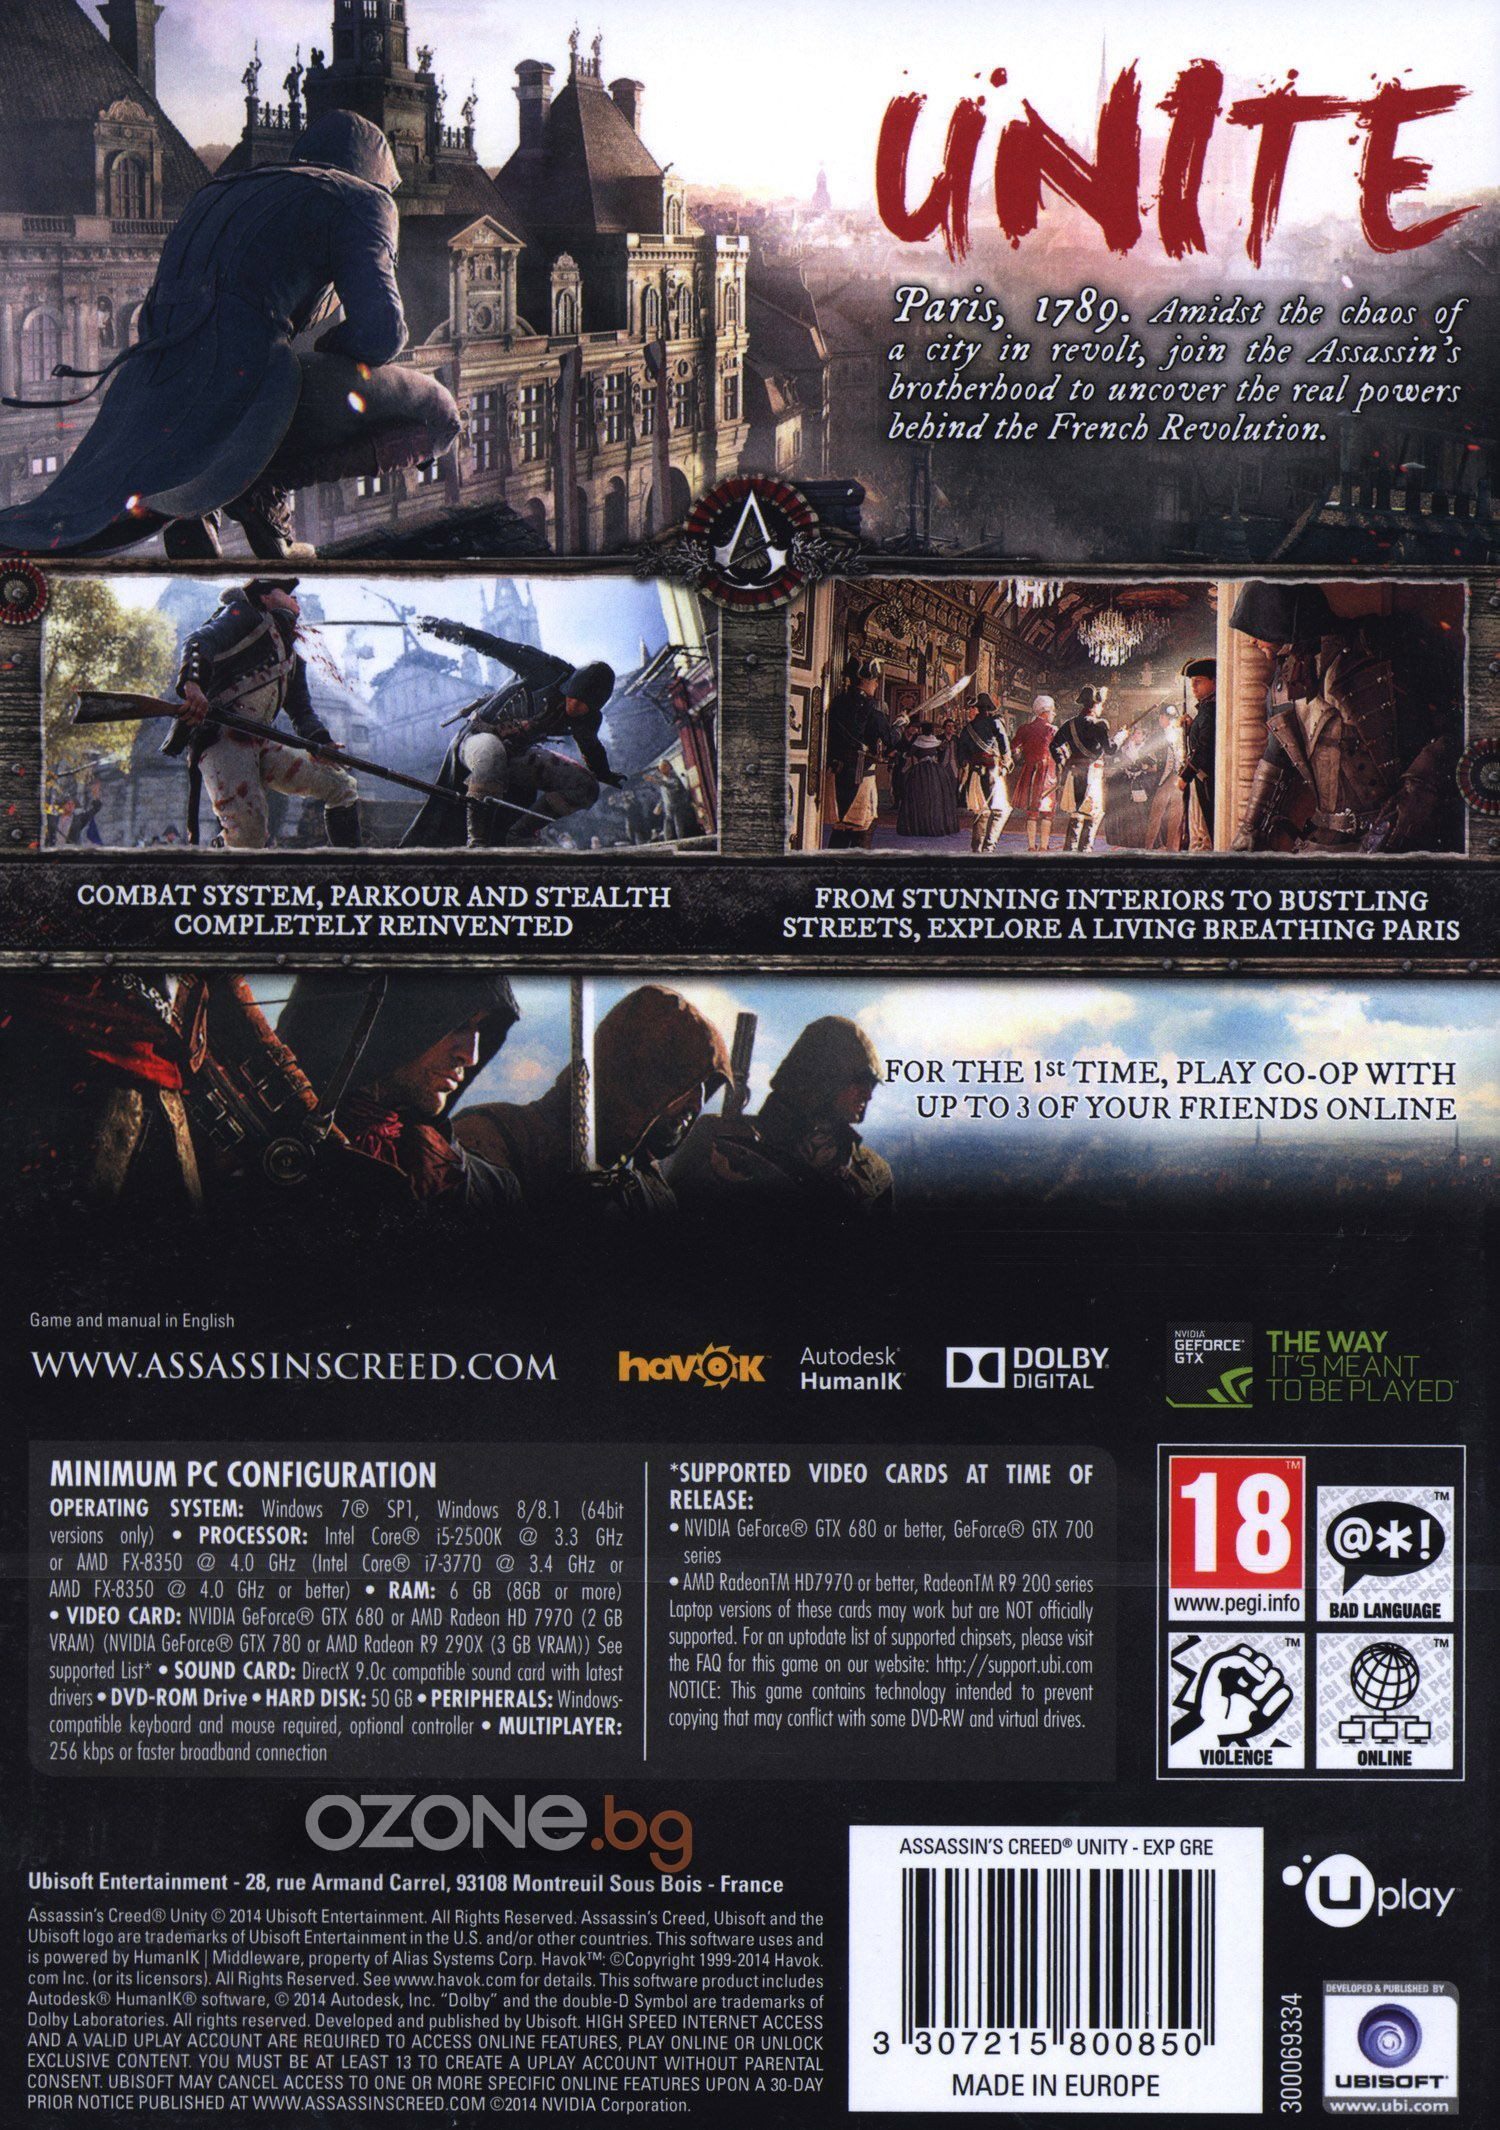 Assassin's Creed Unity (PC) - 5